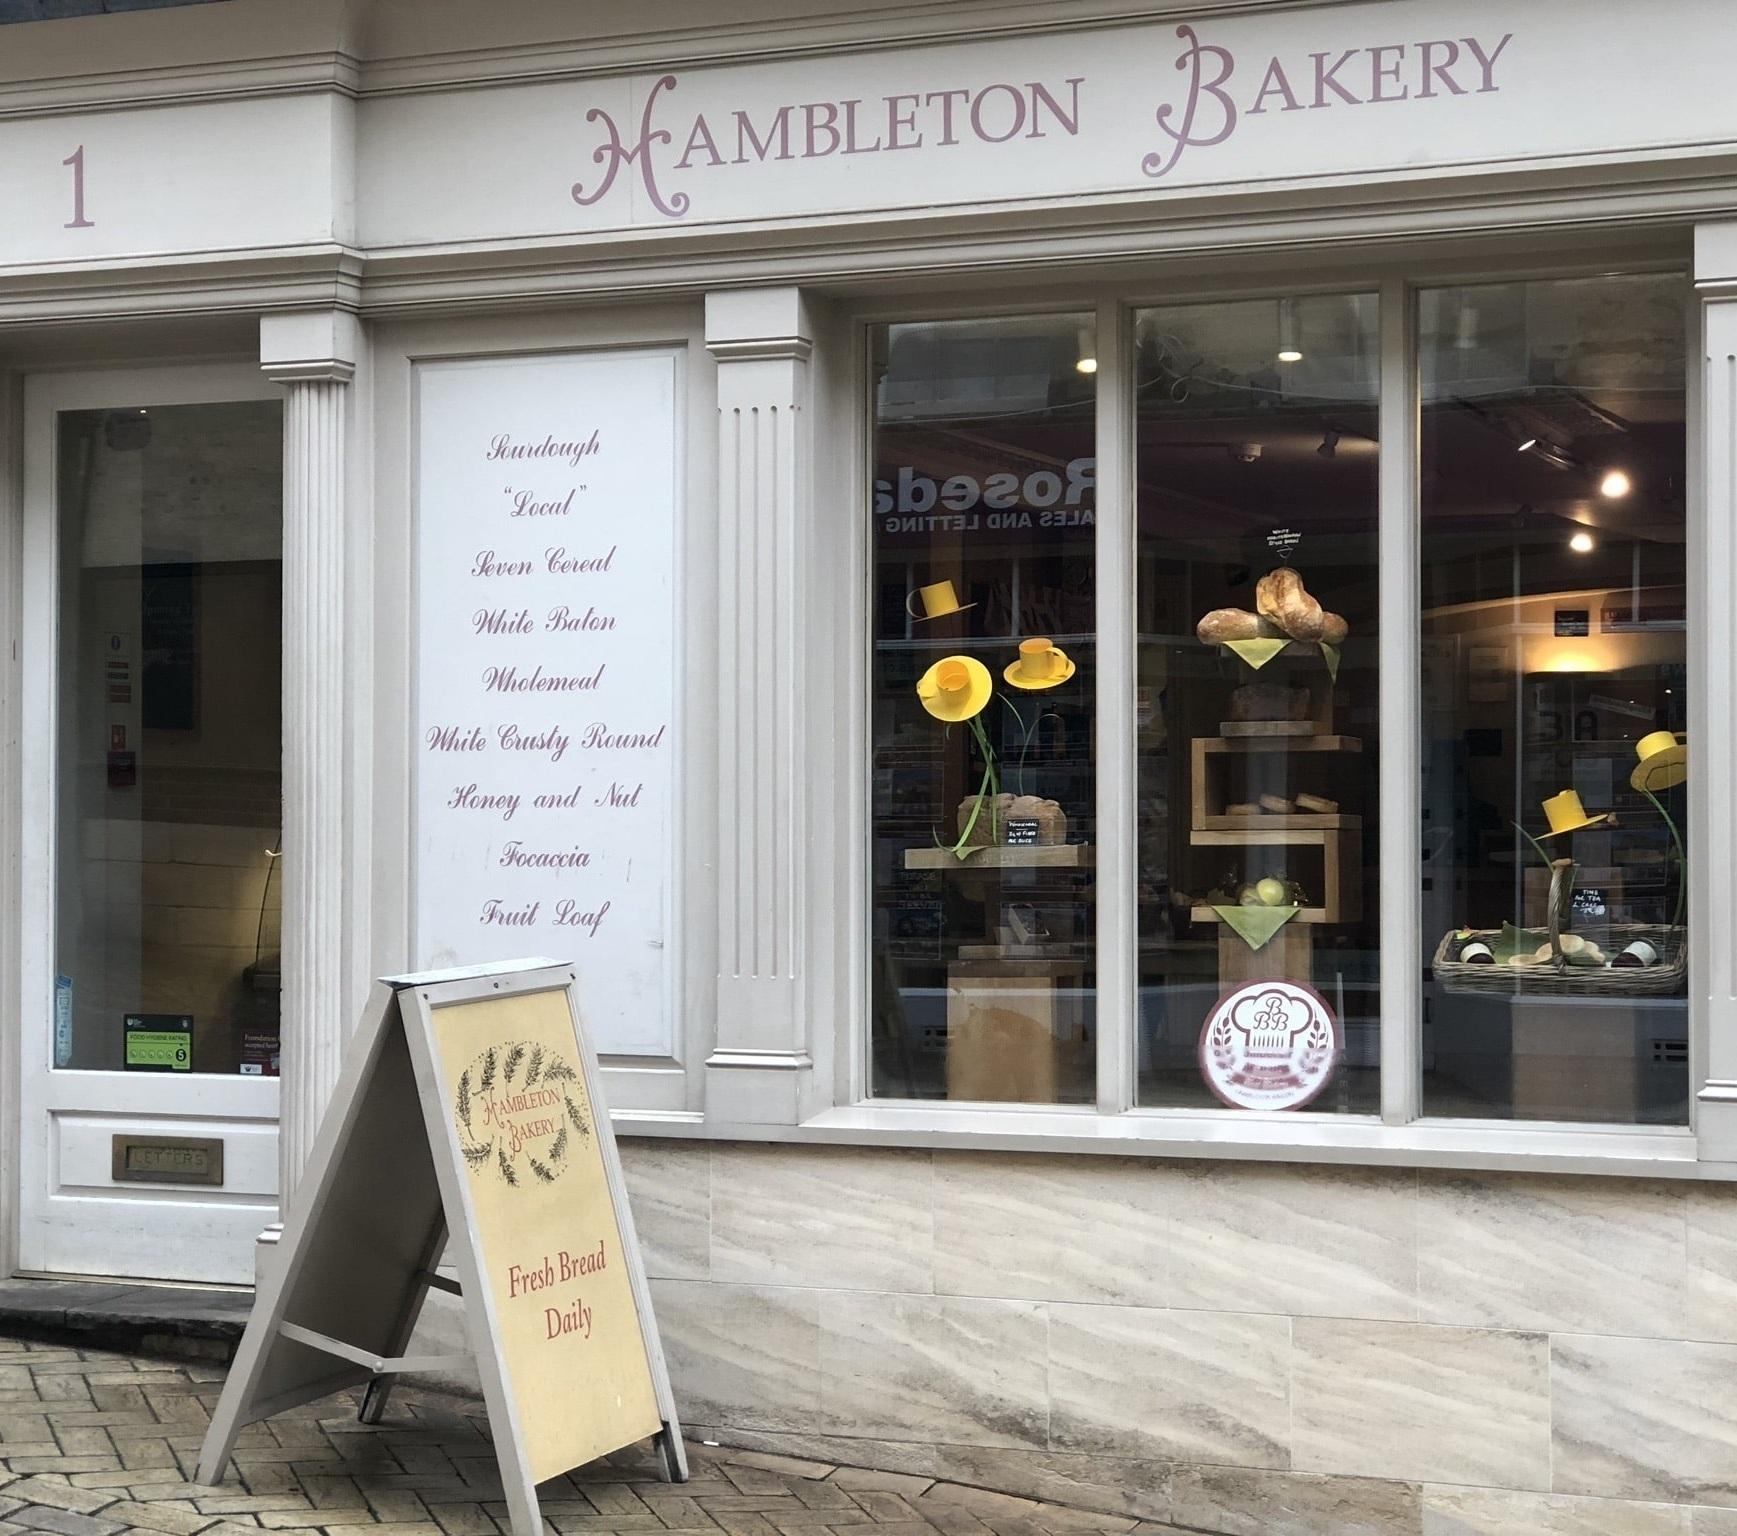 Hambleton_bakery_shop_stamford.jpg